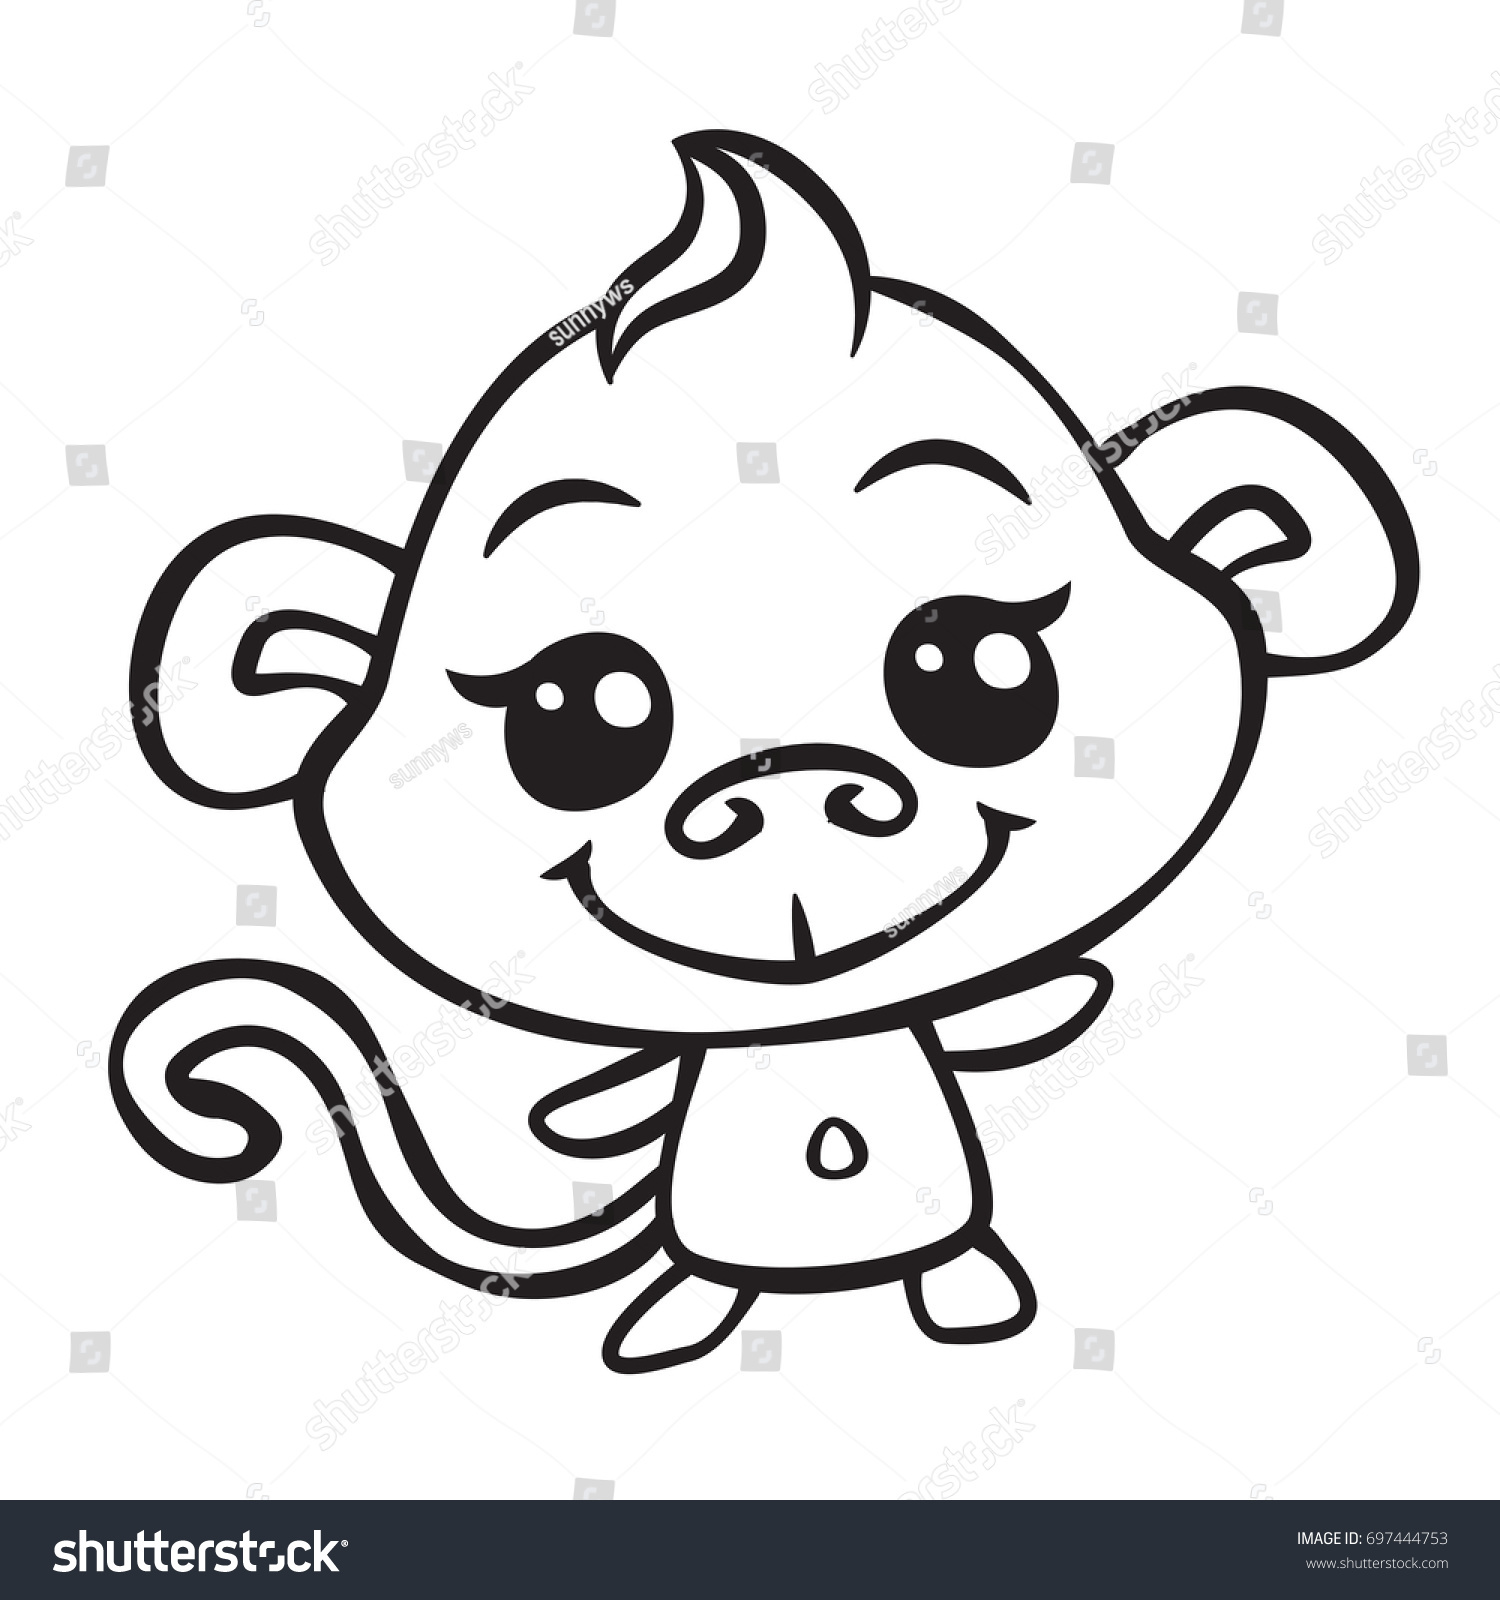 vector cute monkey coloring page illustration | EZ Canvas